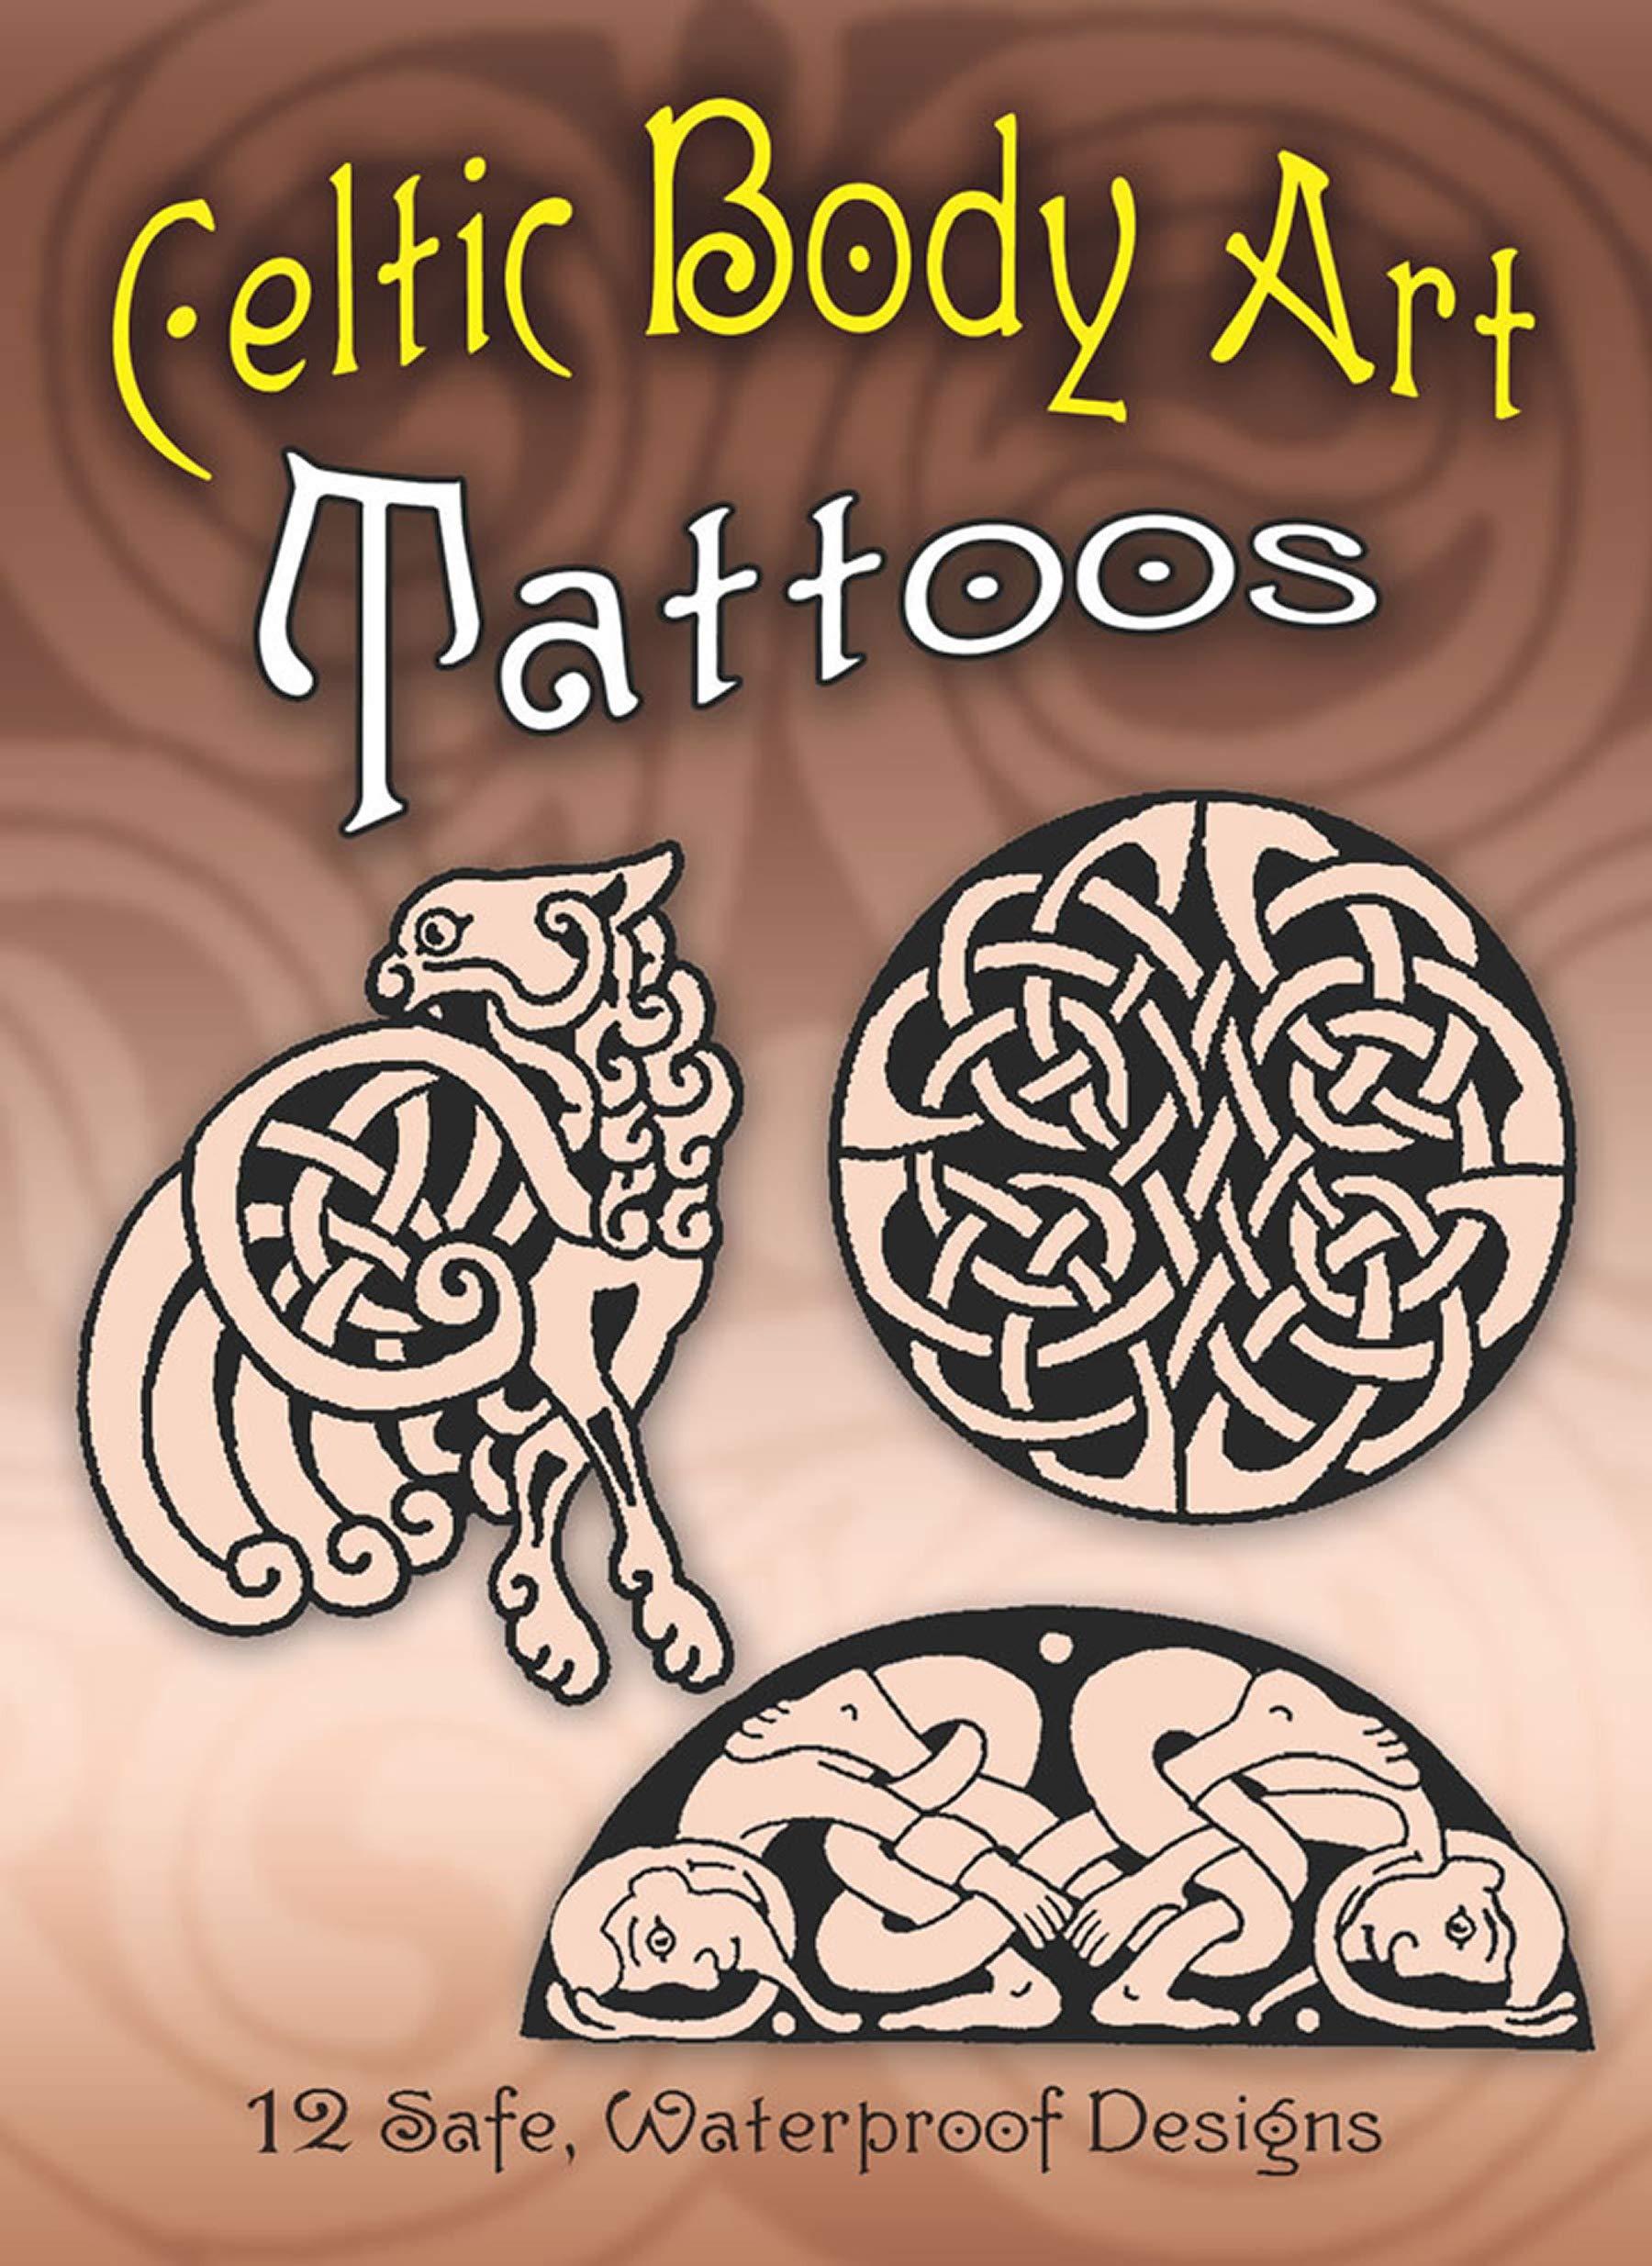 Celtic Body Art Tattoos Dover Tattoos Anna Pomaska 0800759416493 Amazon Com Books